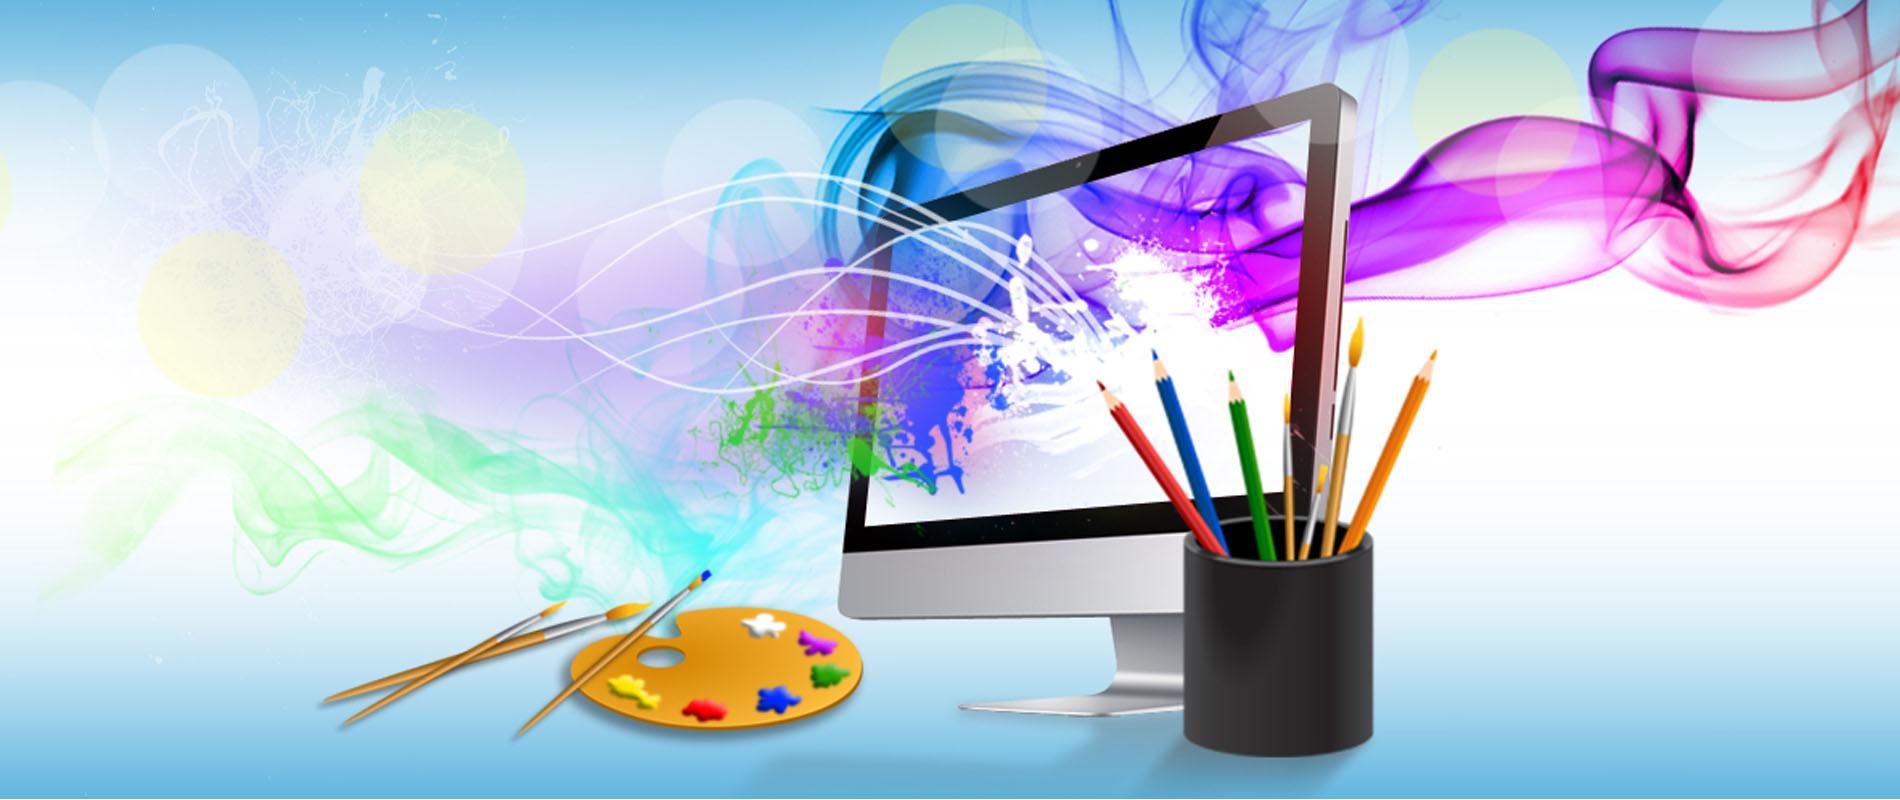 livinggraphix webdesign services 005